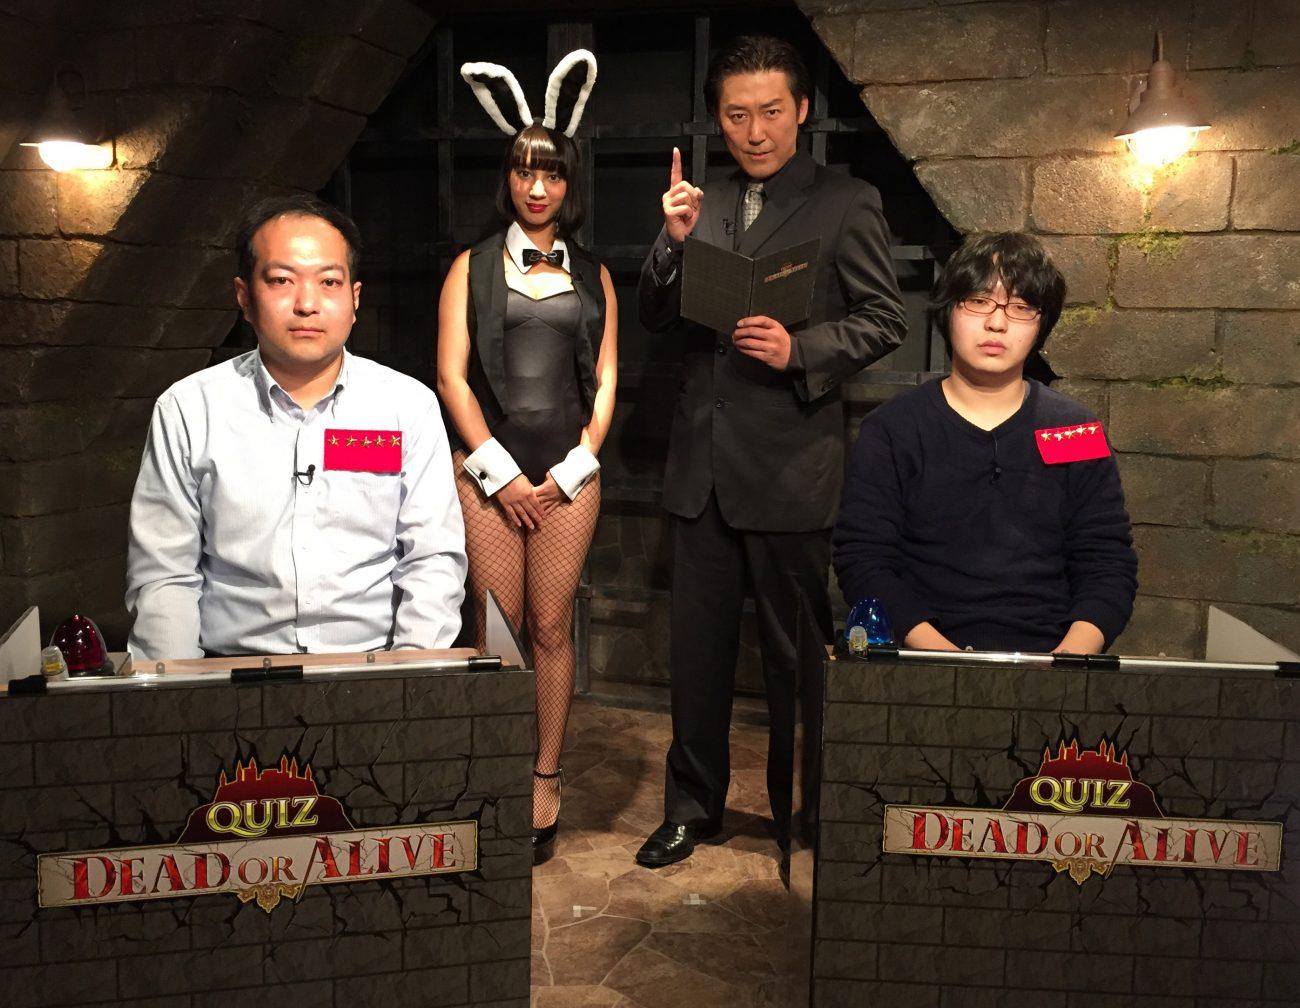 QUIZ JAPAN TVのオリジナルクイズ番組「QUIZ DEAD OR ALIVE」#19は水島丈裕と武藤大貴が激突!